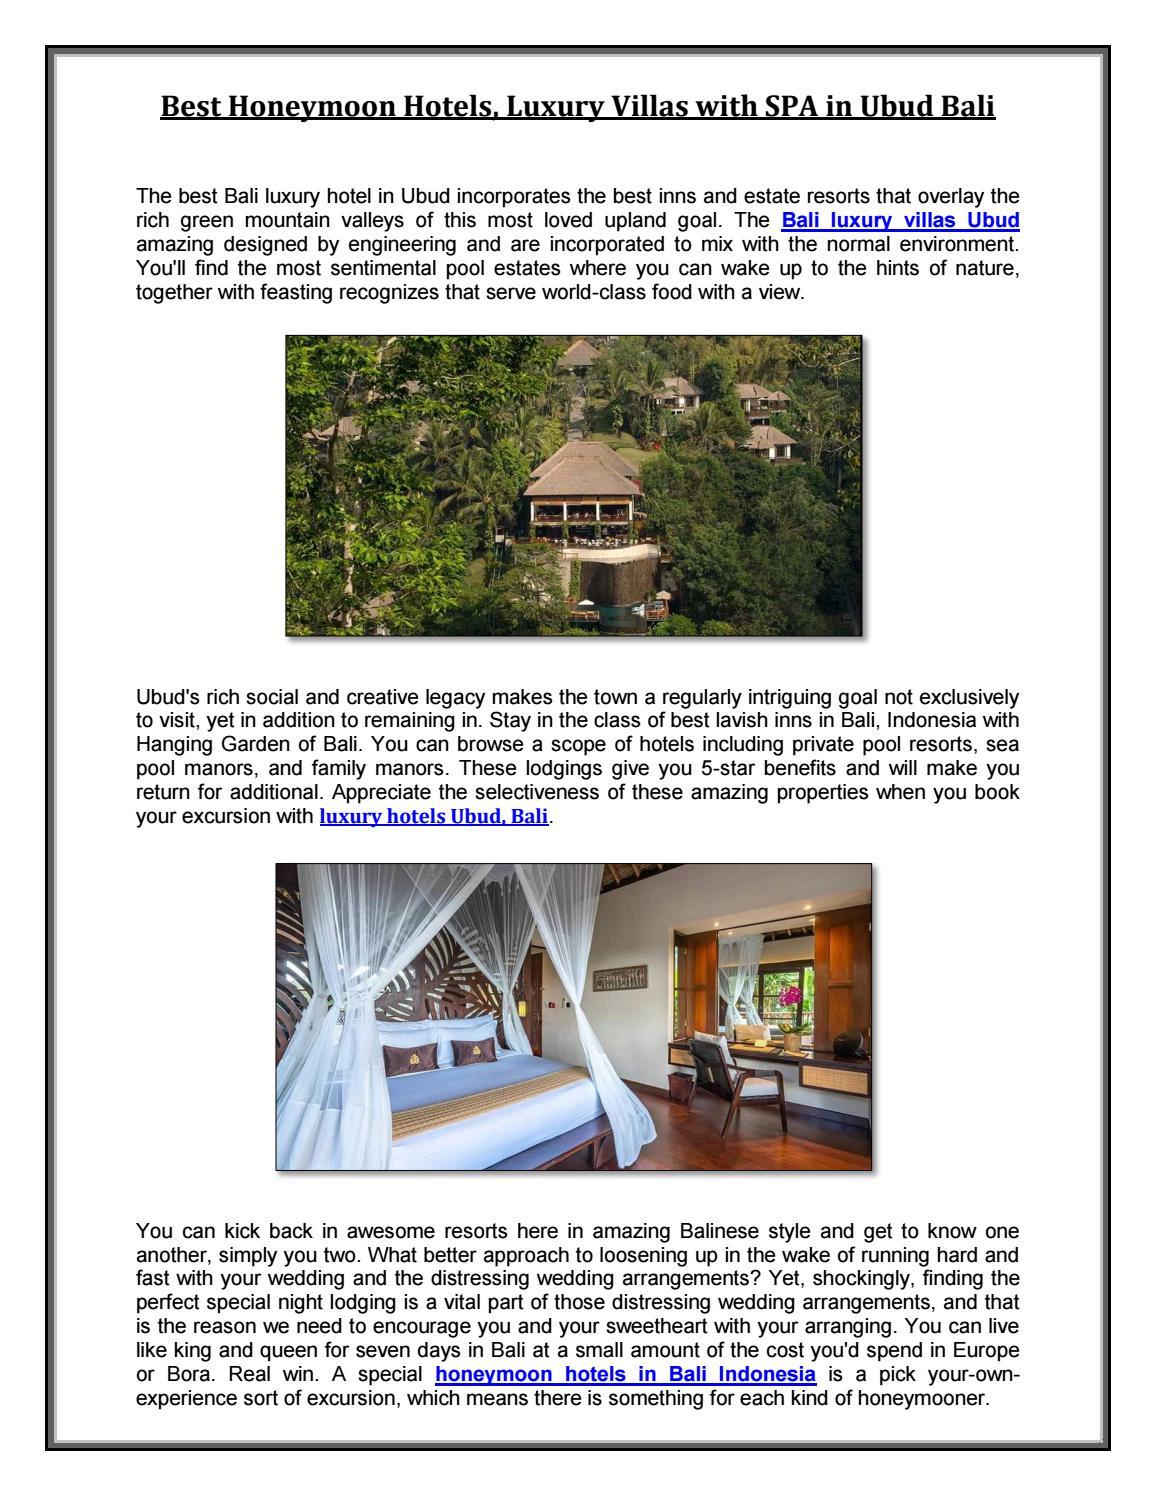 Best Honeymoon Hotels Luxury Villas With Spa In Ubud Bali By Hanging Gardens Of Bali Issuu